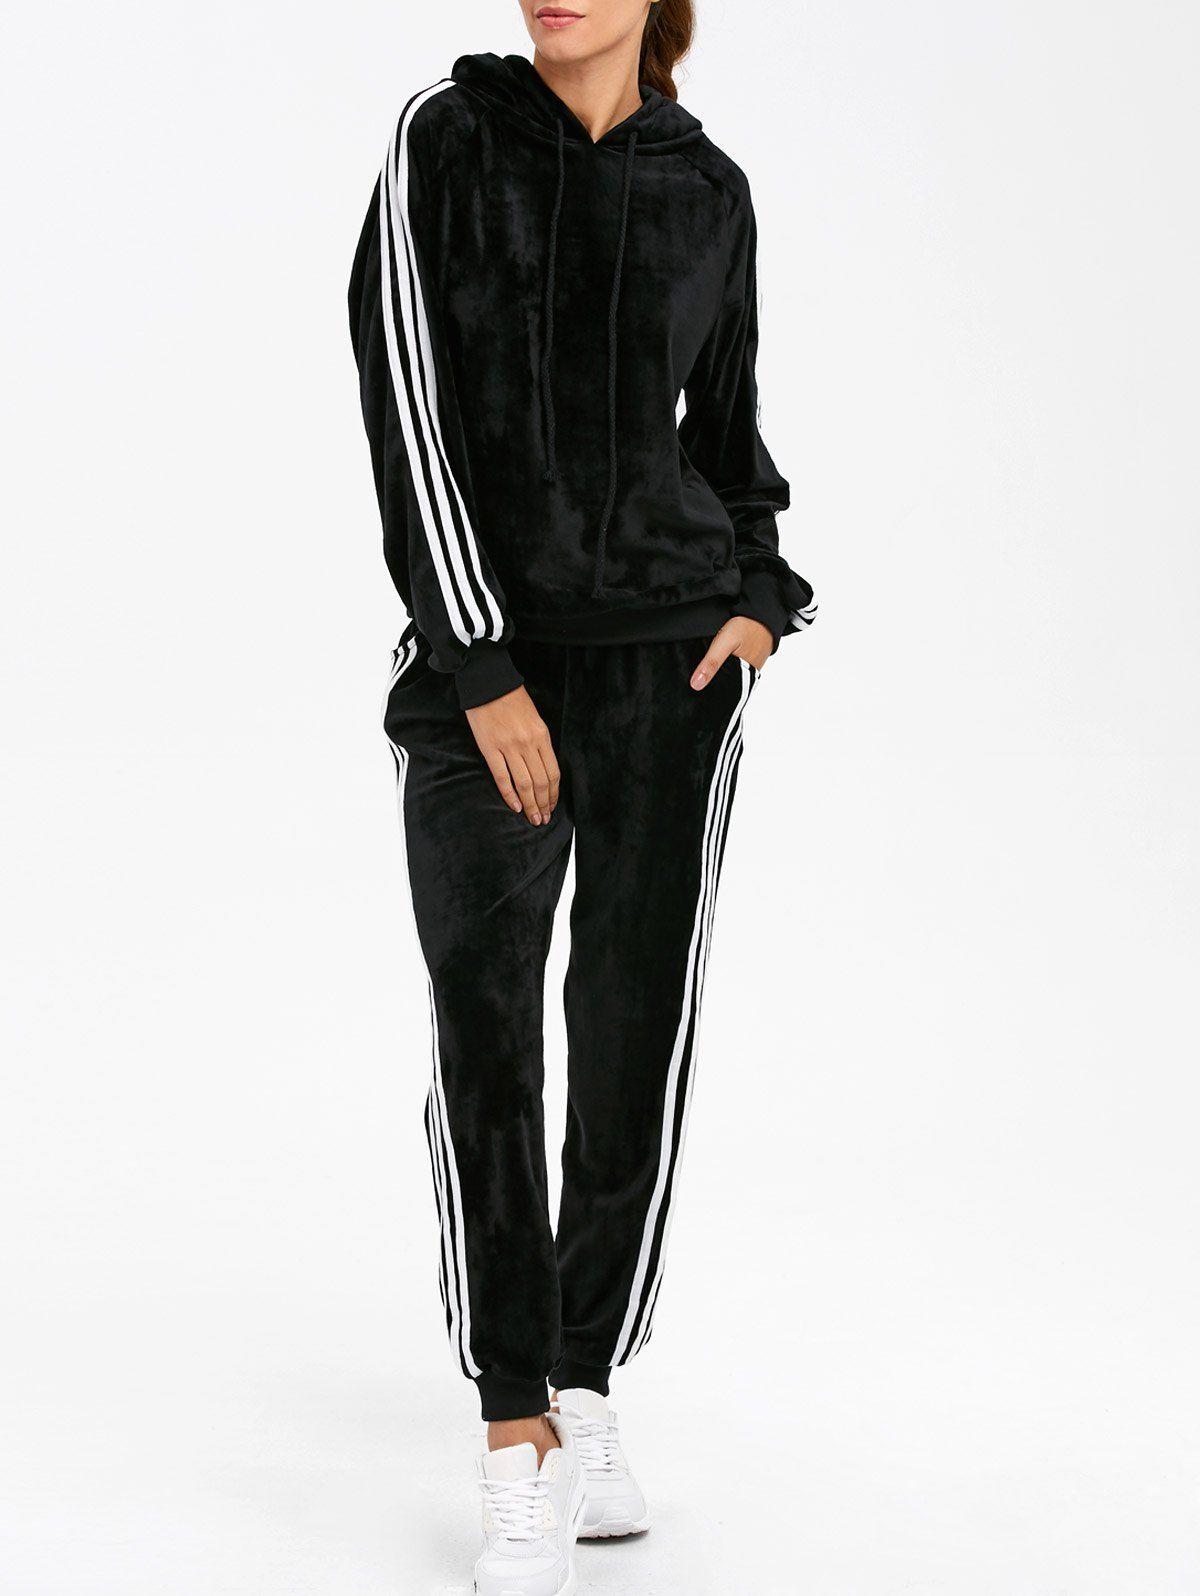 75174c34cdf241 Velvet Hoodie And Sweatpants BLACK: Gym Sets | ZAFUL | Sweats ...